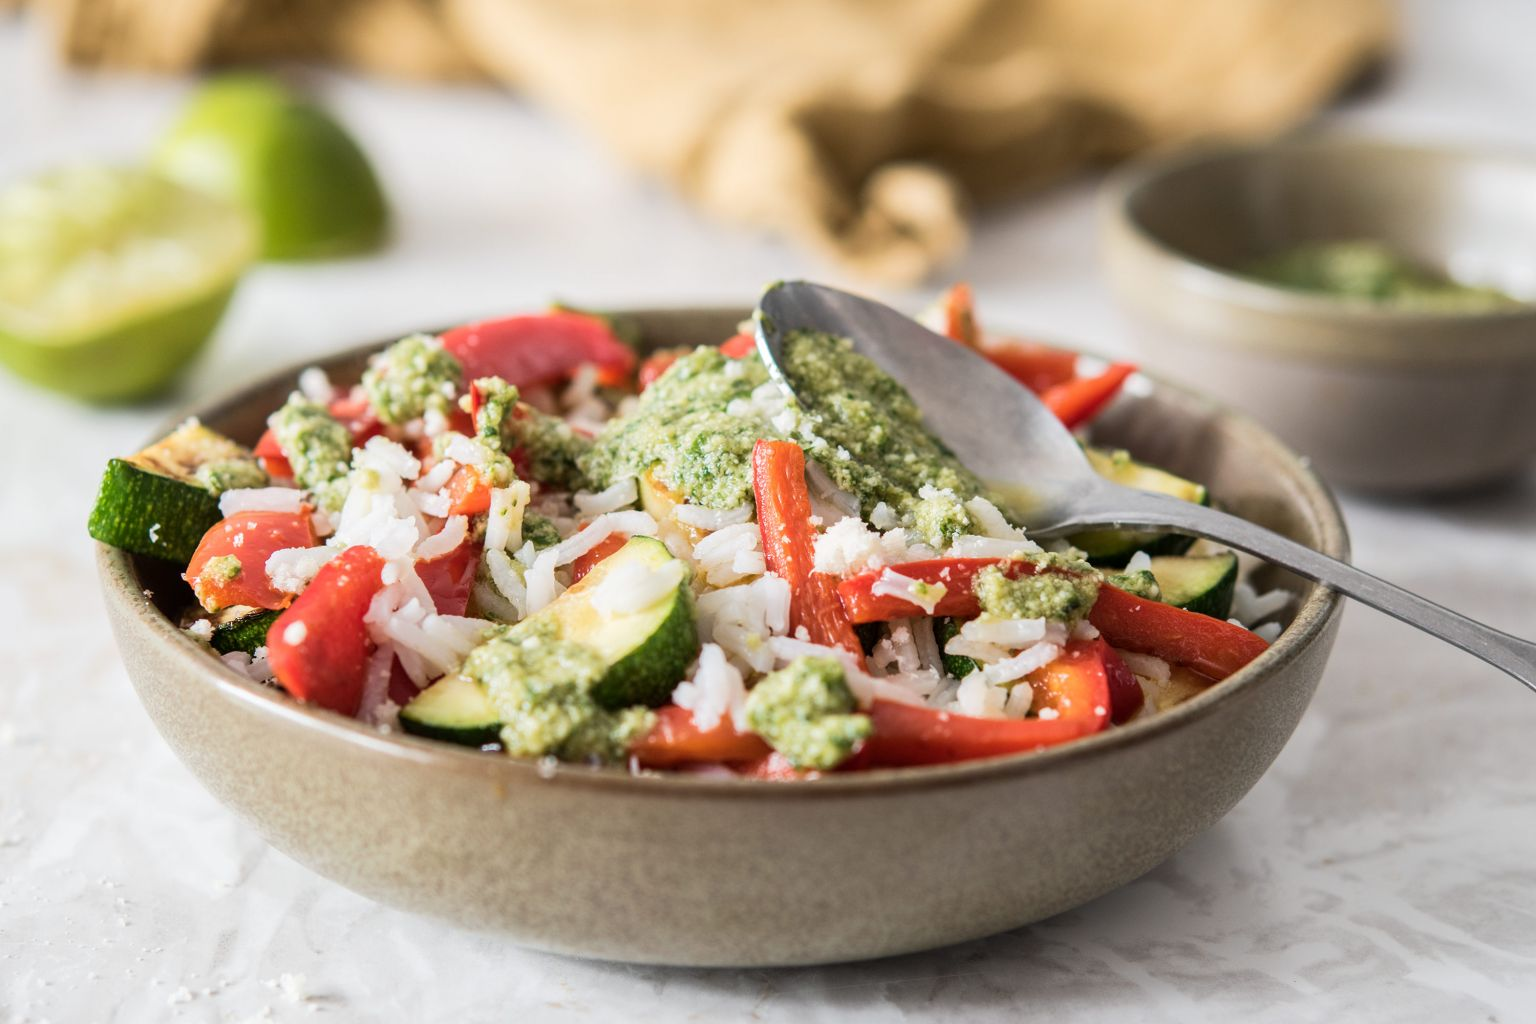 Salade de riz au pesto de basilic et citron vert